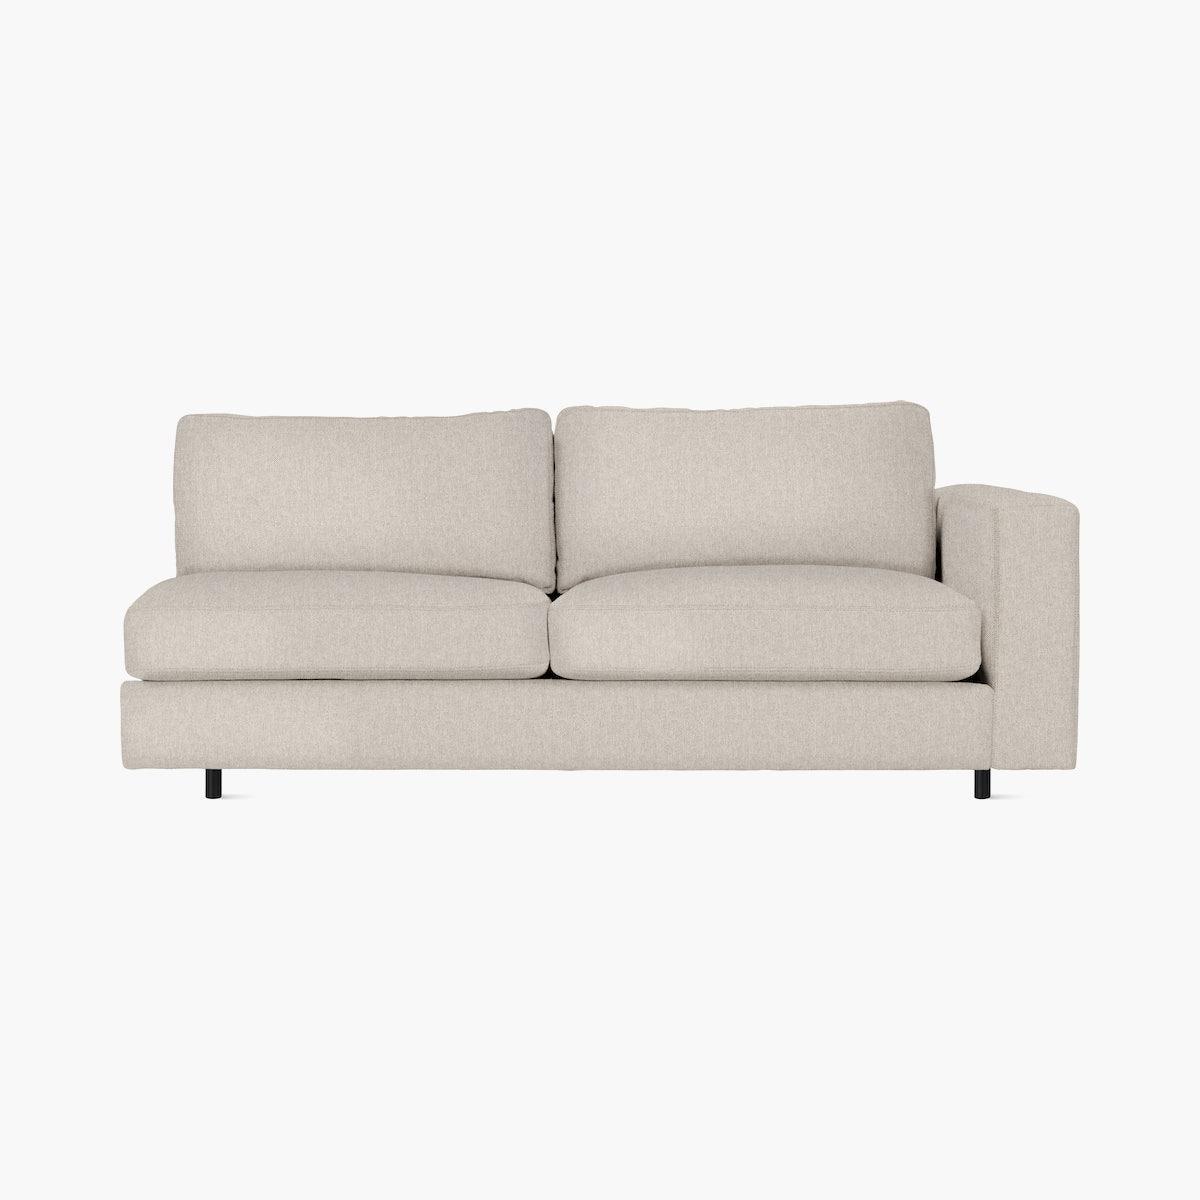 Reid Sleeper One-Arm Sofa